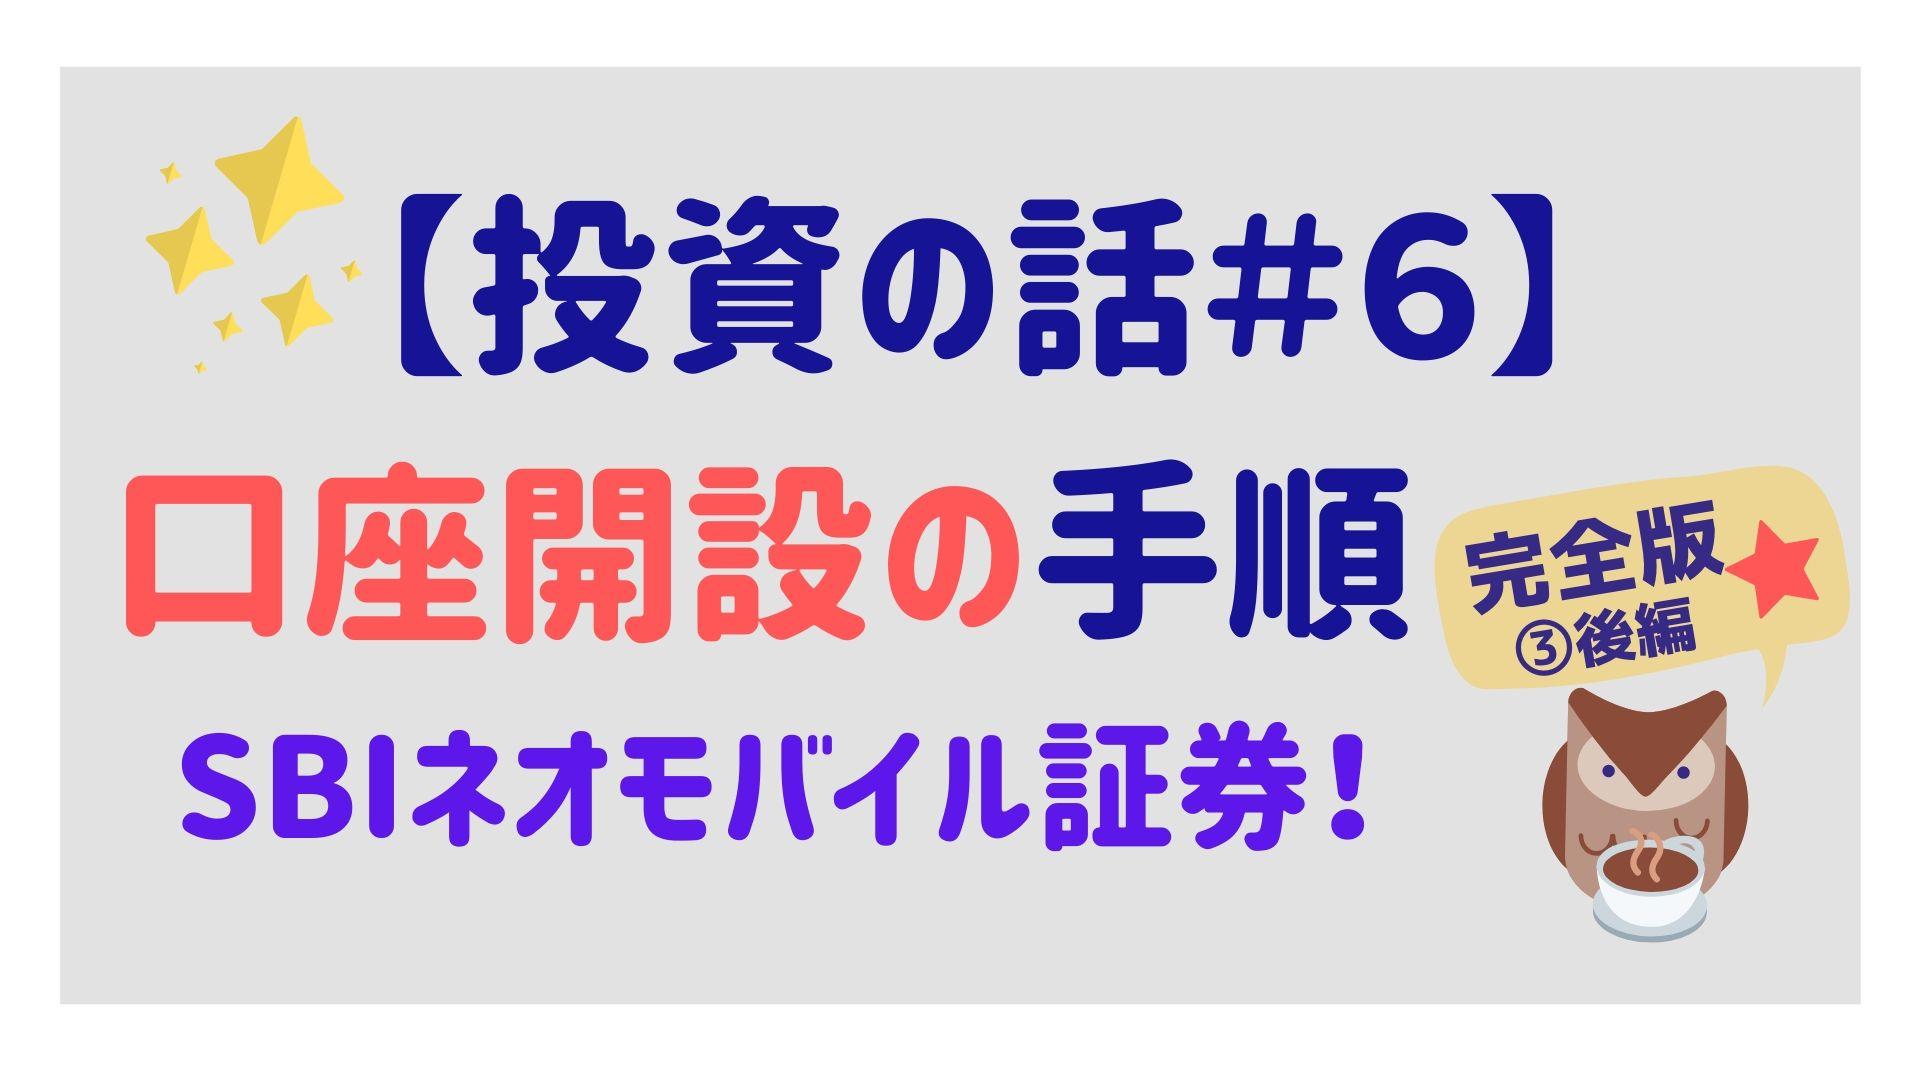 【SBIネオモバイル証券】口座開設の手順!完全版/後編